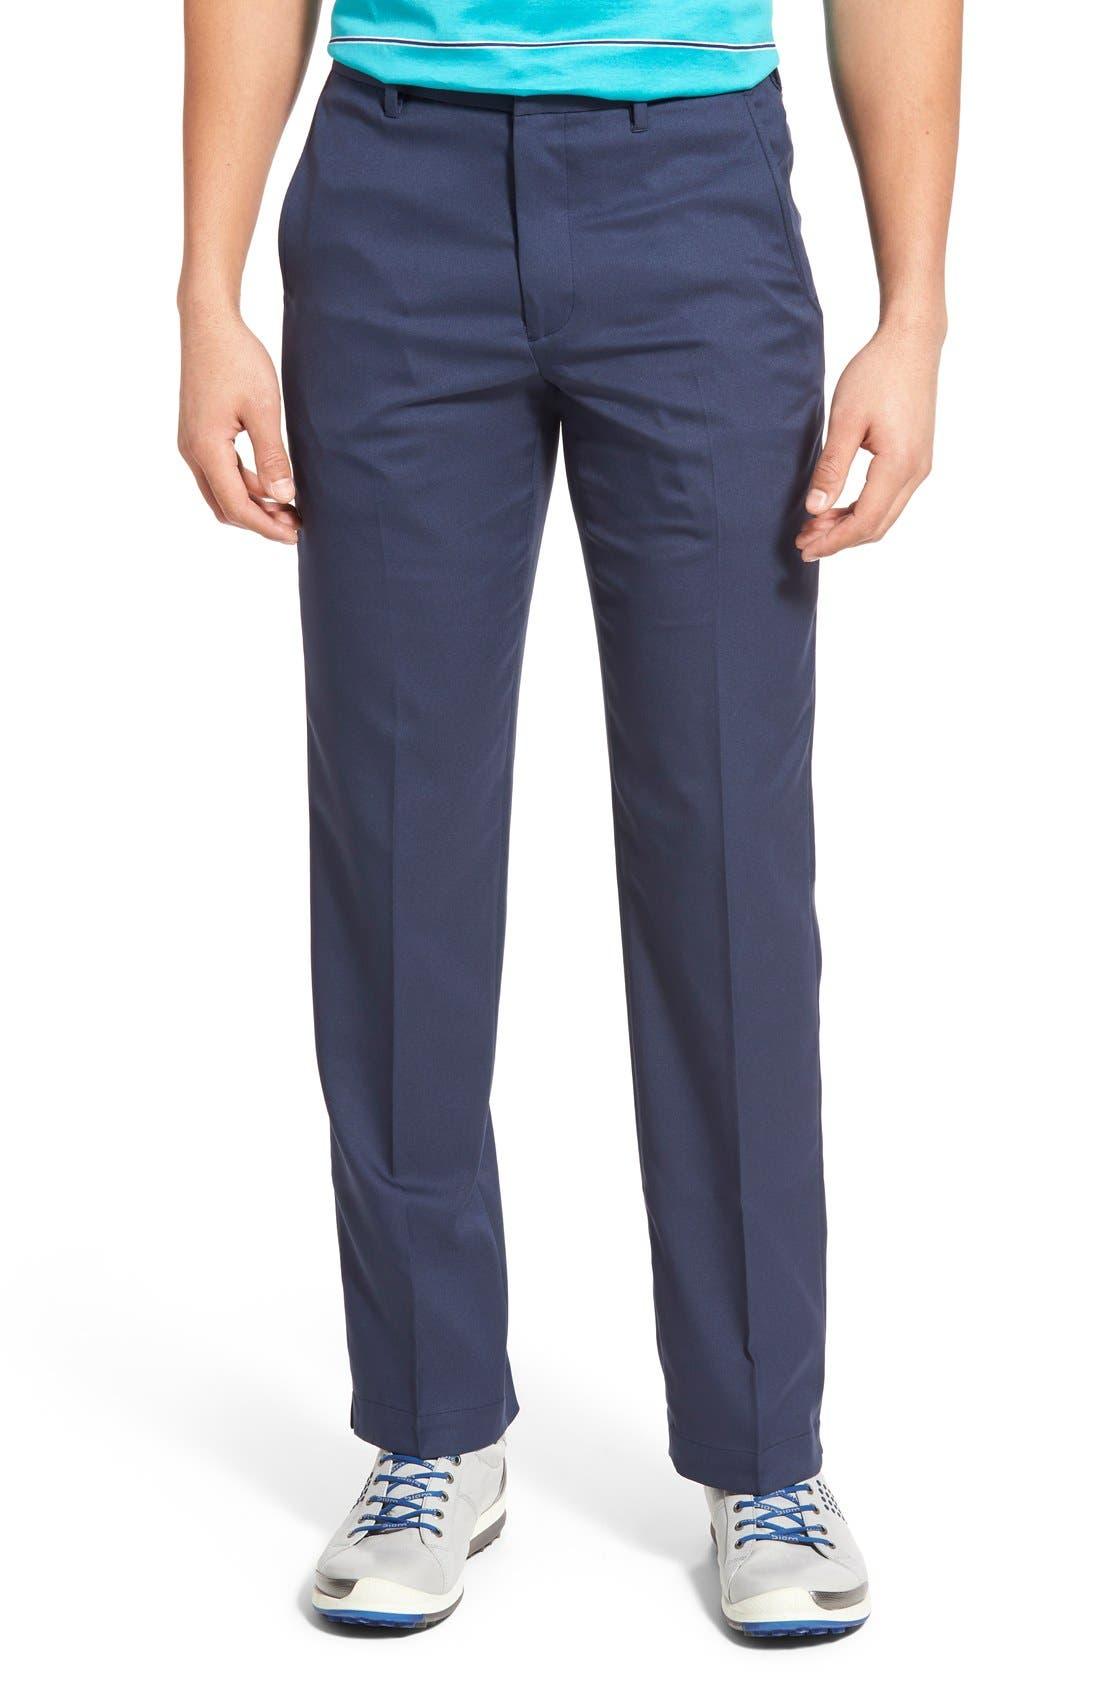 Alternate Image 1 Selected - Bobby Jones 'Tech' Flat Front Wrinkle Free Golf Pants